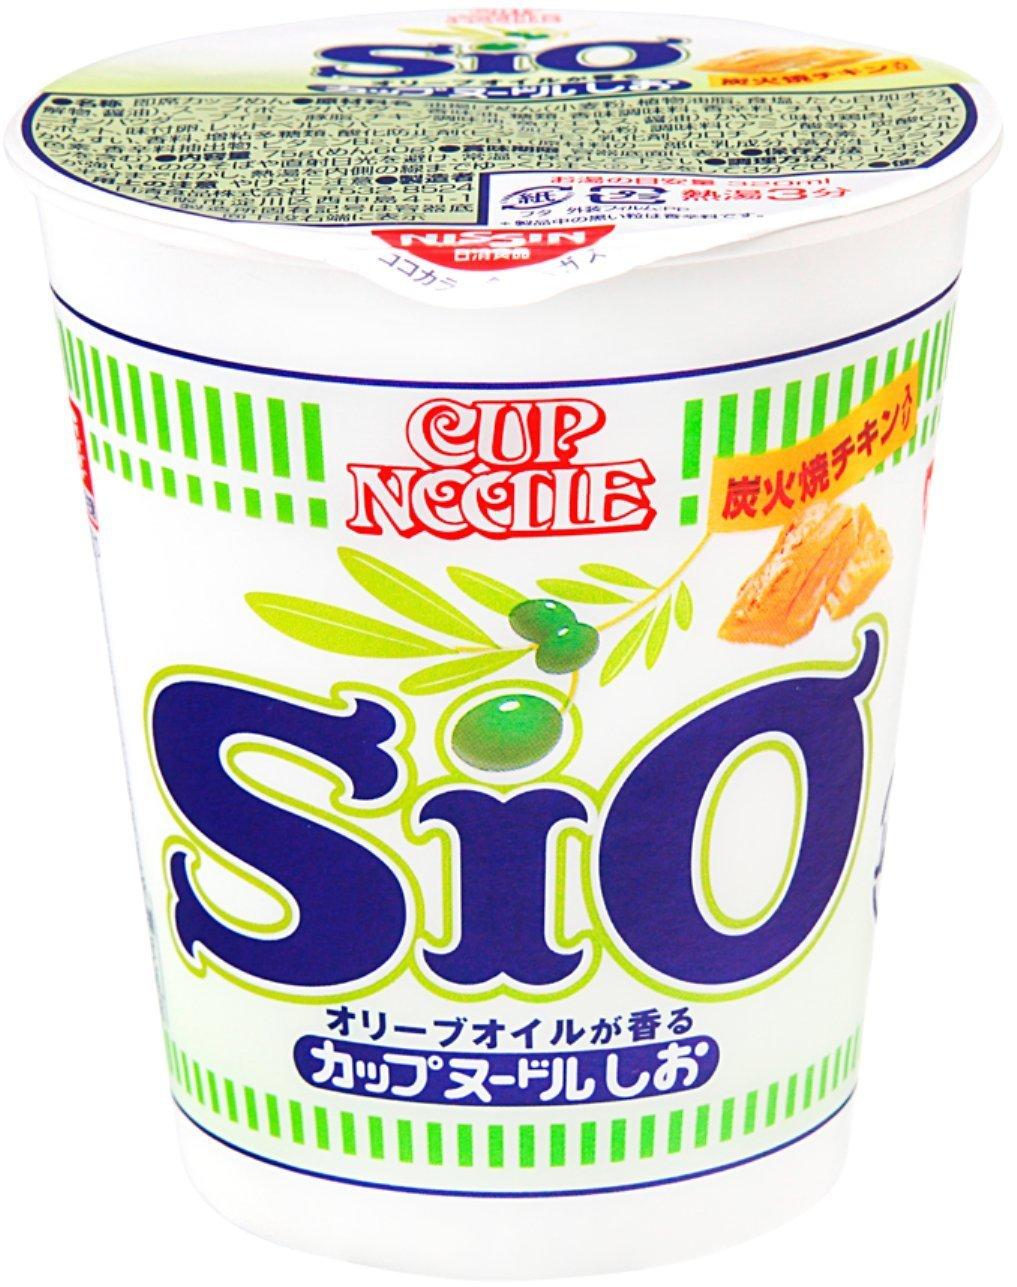 Рамен Cup Noodle (Соль и оливковое масло)